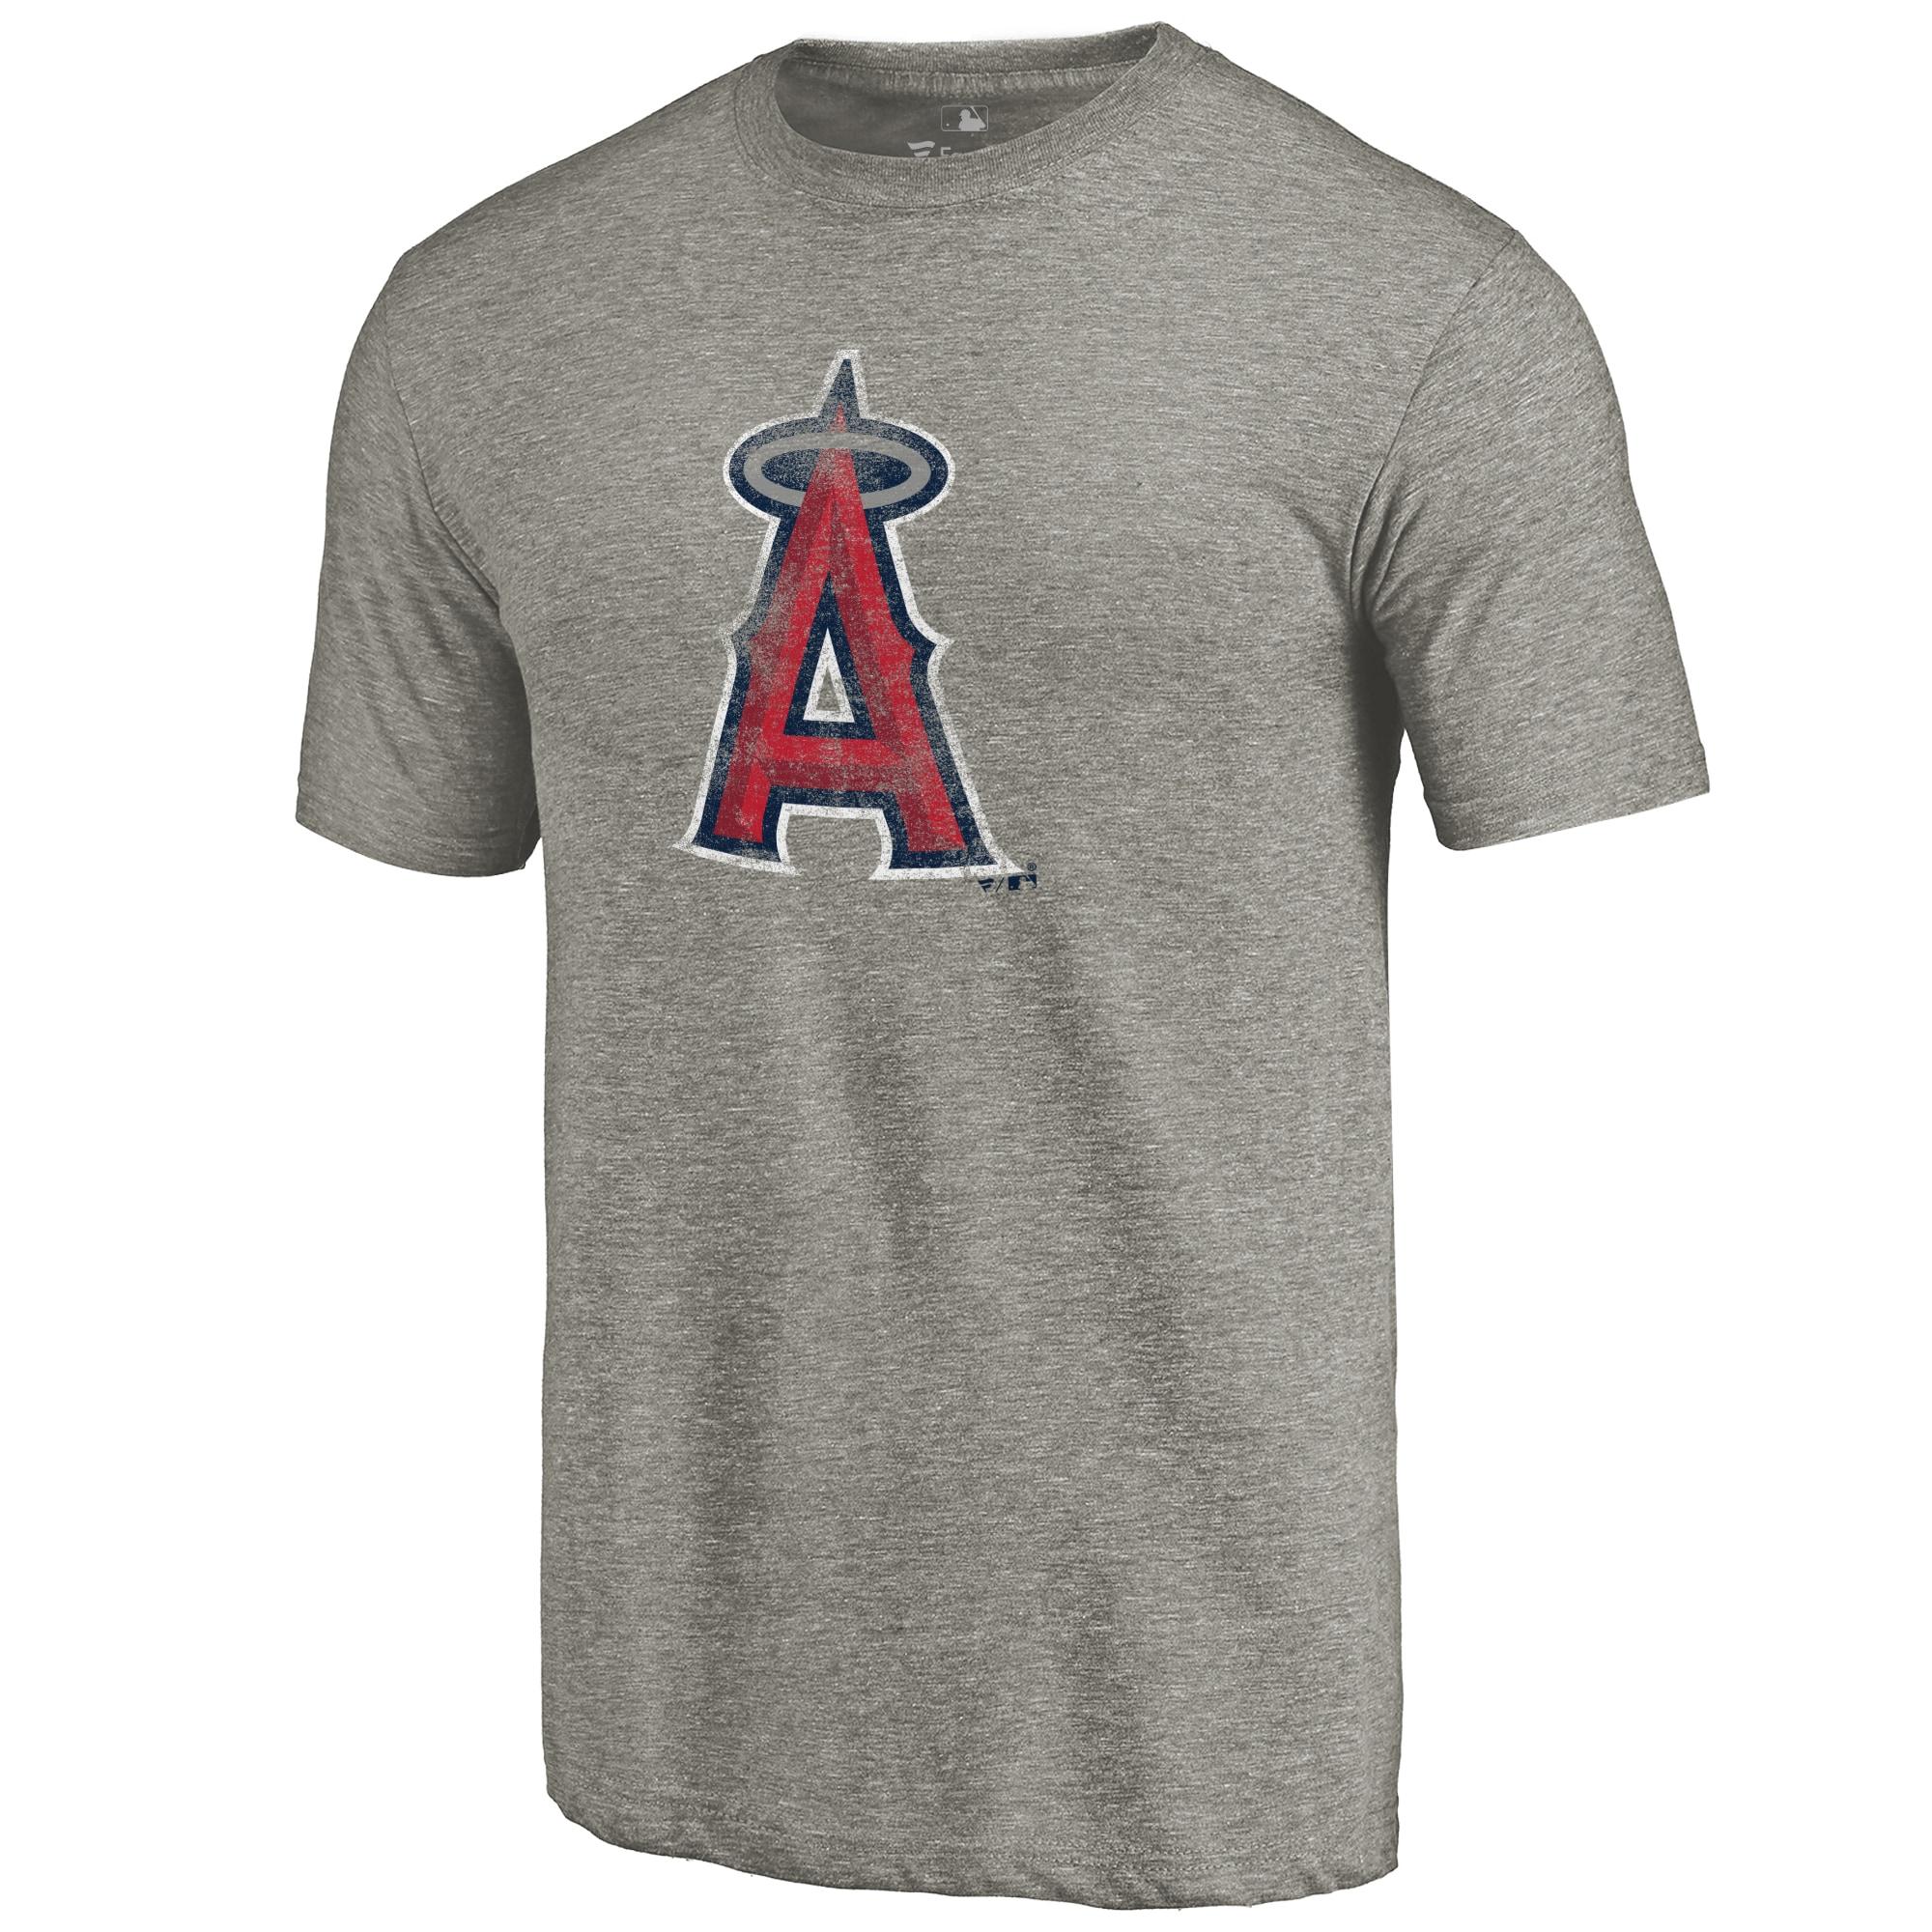 Los Angeles Angels Distressed Team Tri-Blend T-Shirt - Ash